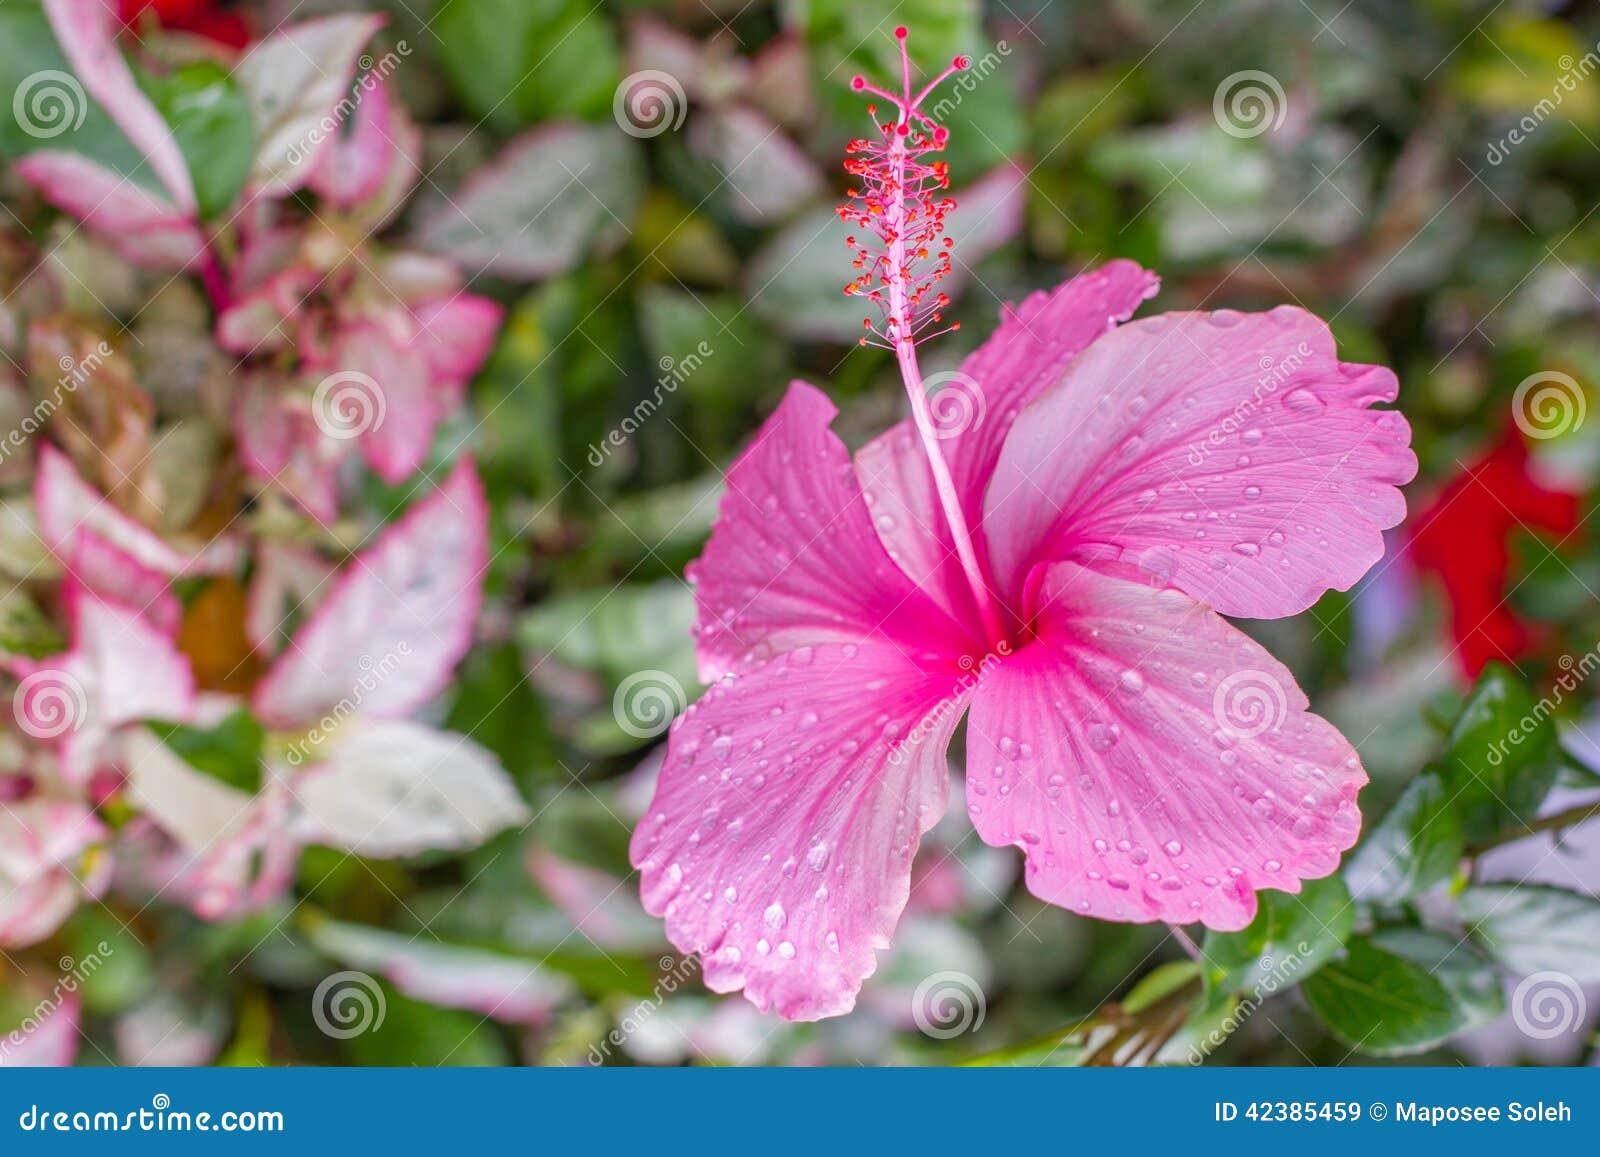 Hibiscus flowers thai flower stock photo image 42385459 flower flowers hibiscus dhlflorist Image collections